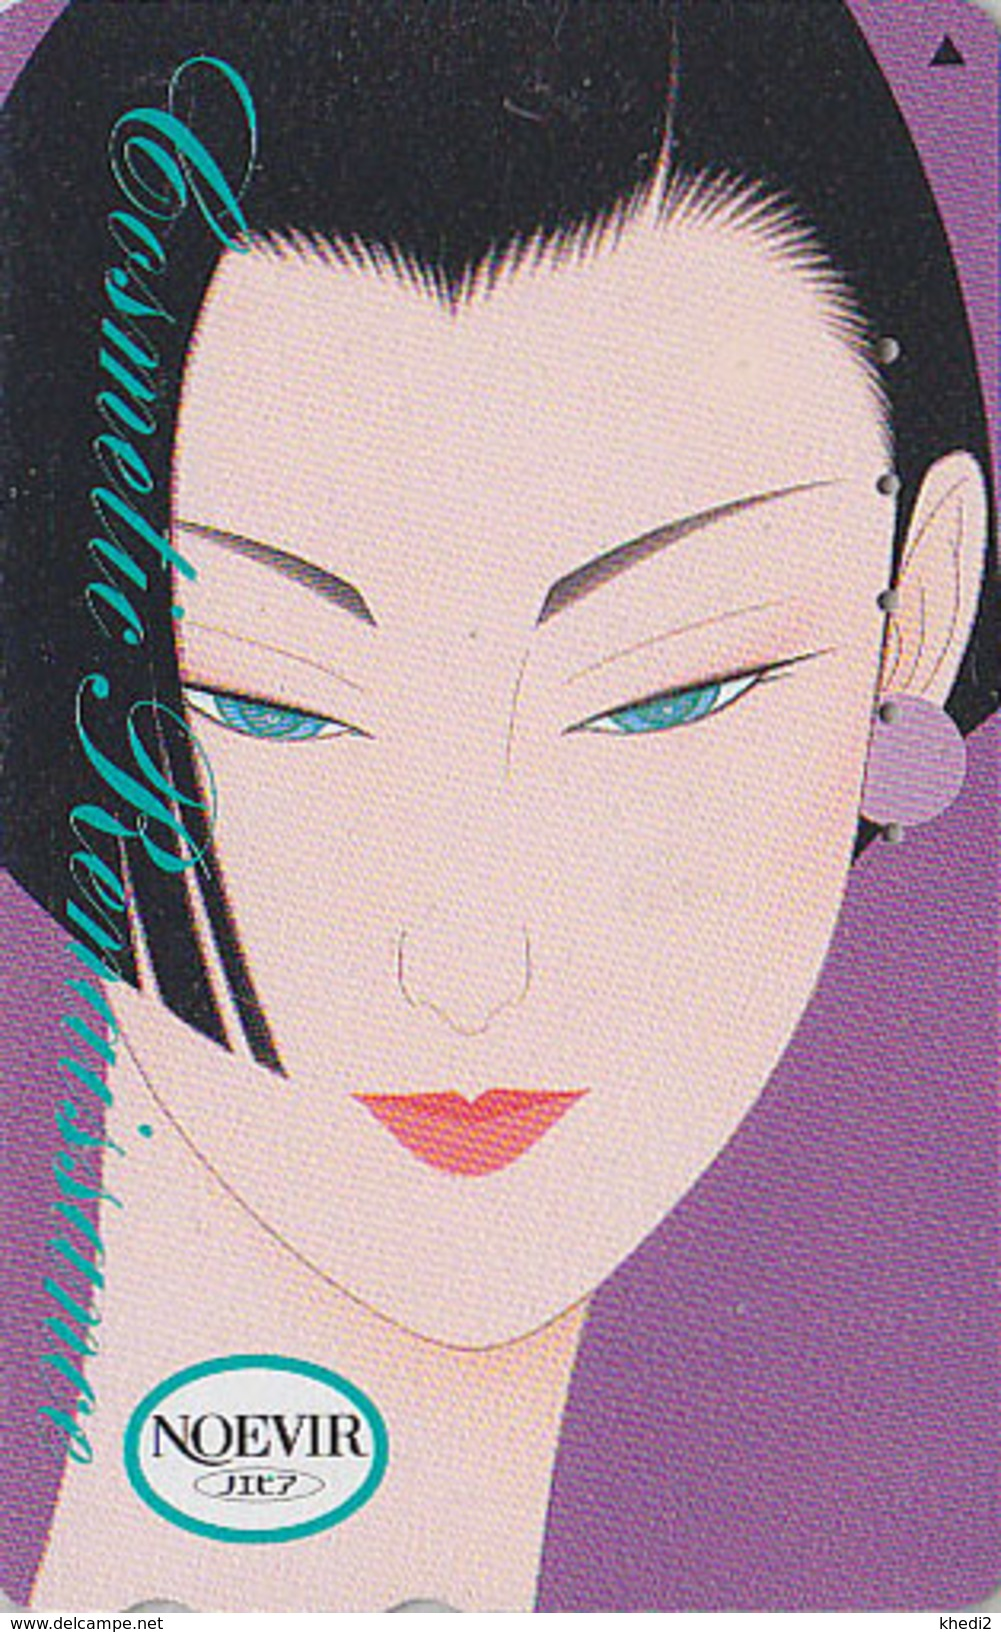 Télécarte Japon / 110-189104 - Cosmétiques NOEVIR / Femme Girl - Japan Cosmetics Cosmetic Phonecard Parfum Perfume - 209 - Parfum